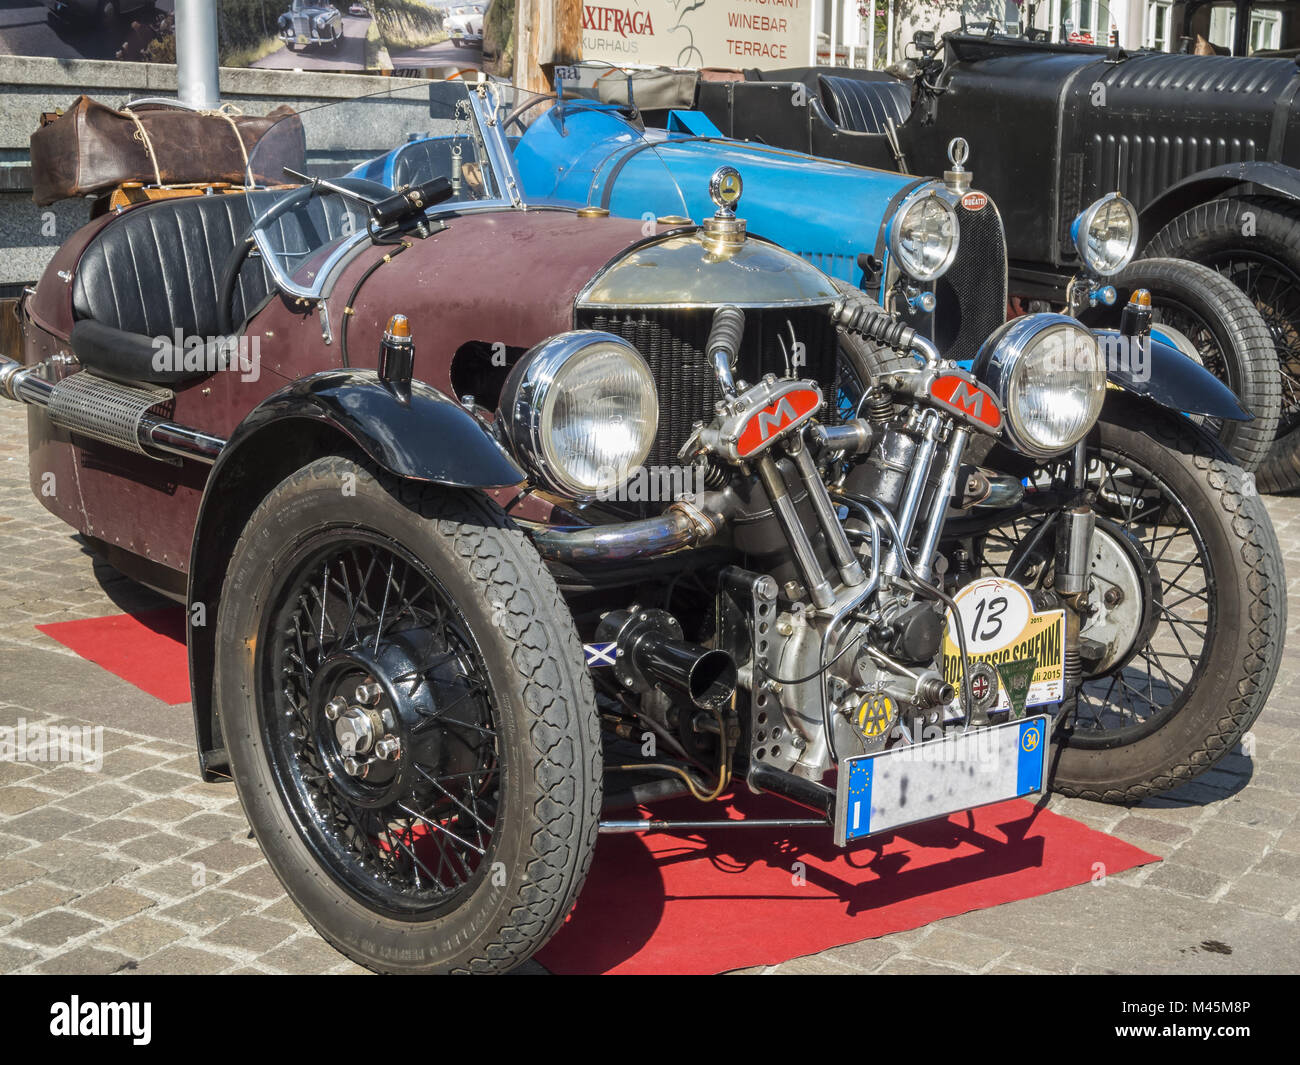 Südtirol Classic Cars_2015_Morgan three wheeler_front totale - Stock Image